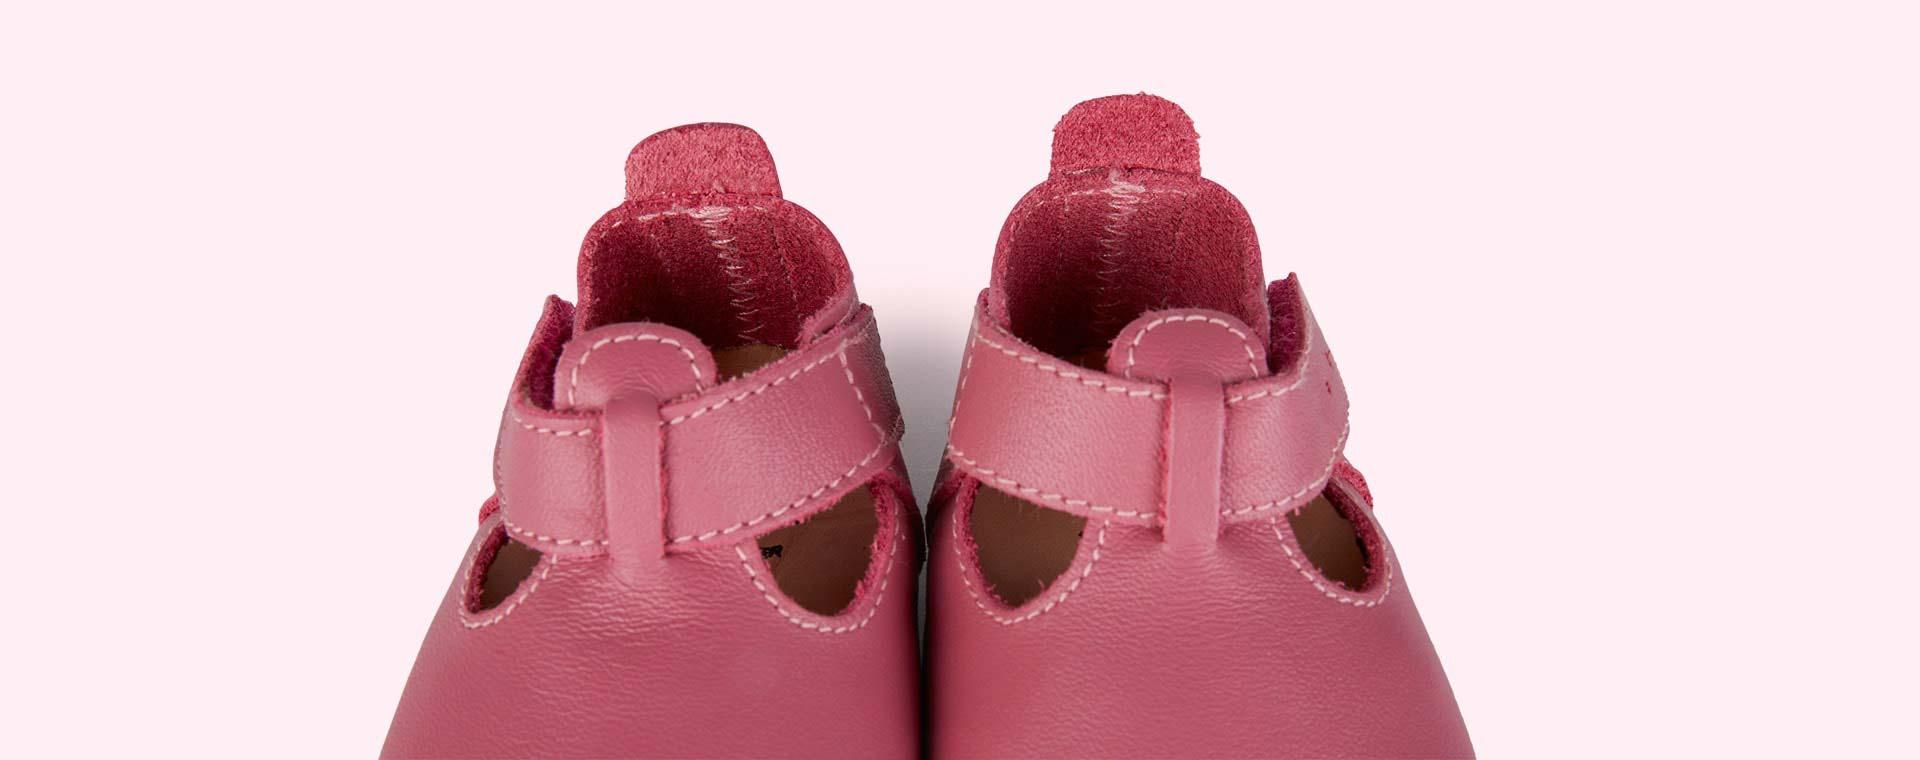 c902b84e6104 Buy the Bobux Soft Sole Classic T-Bar Shoe at KIDLY Ireland